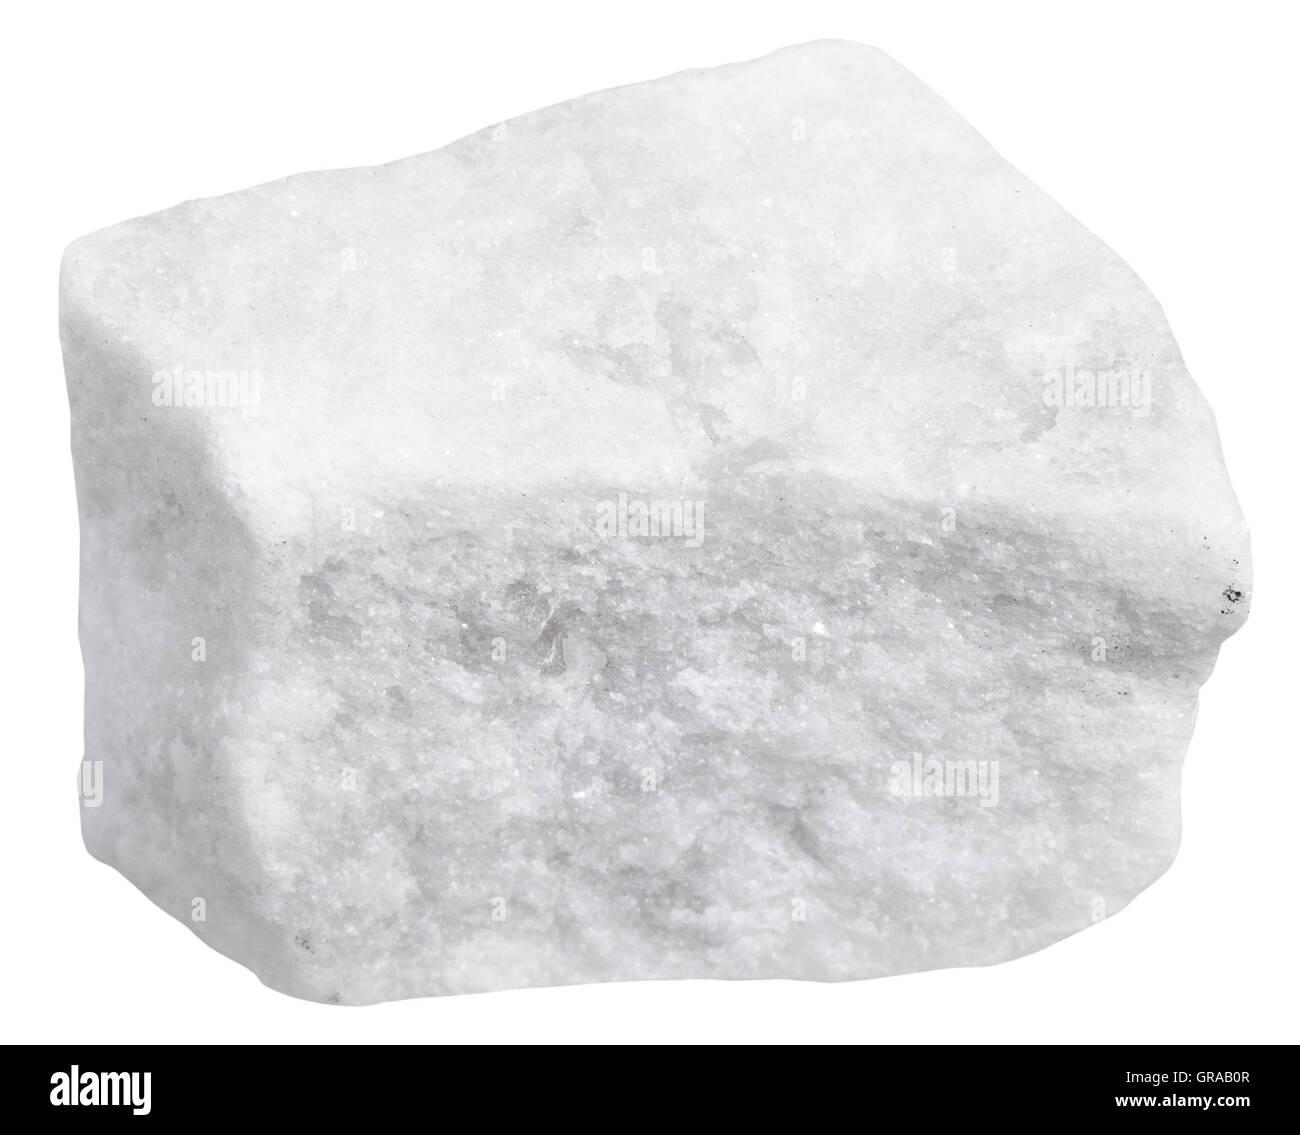 White Metamorphic Rock : Macro shooting of metamorphic rock specimens piece